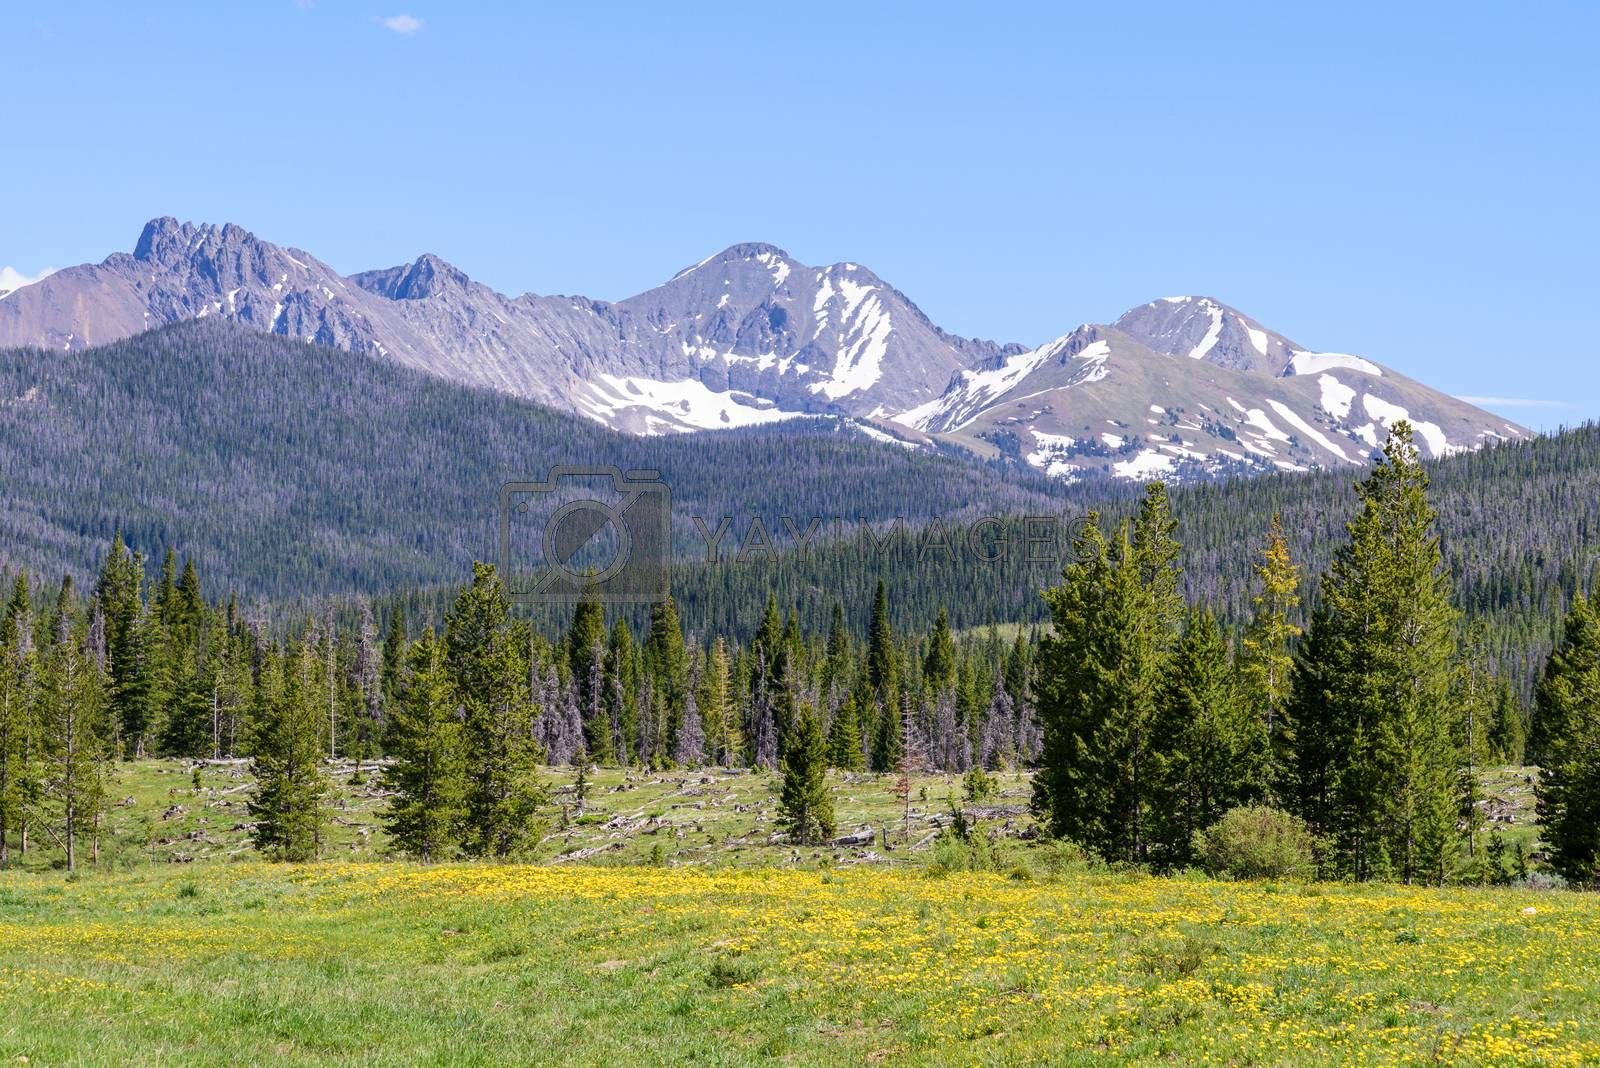 Colorado Scenic Beauty - Laramie Mountain Meadow by Gary Gray